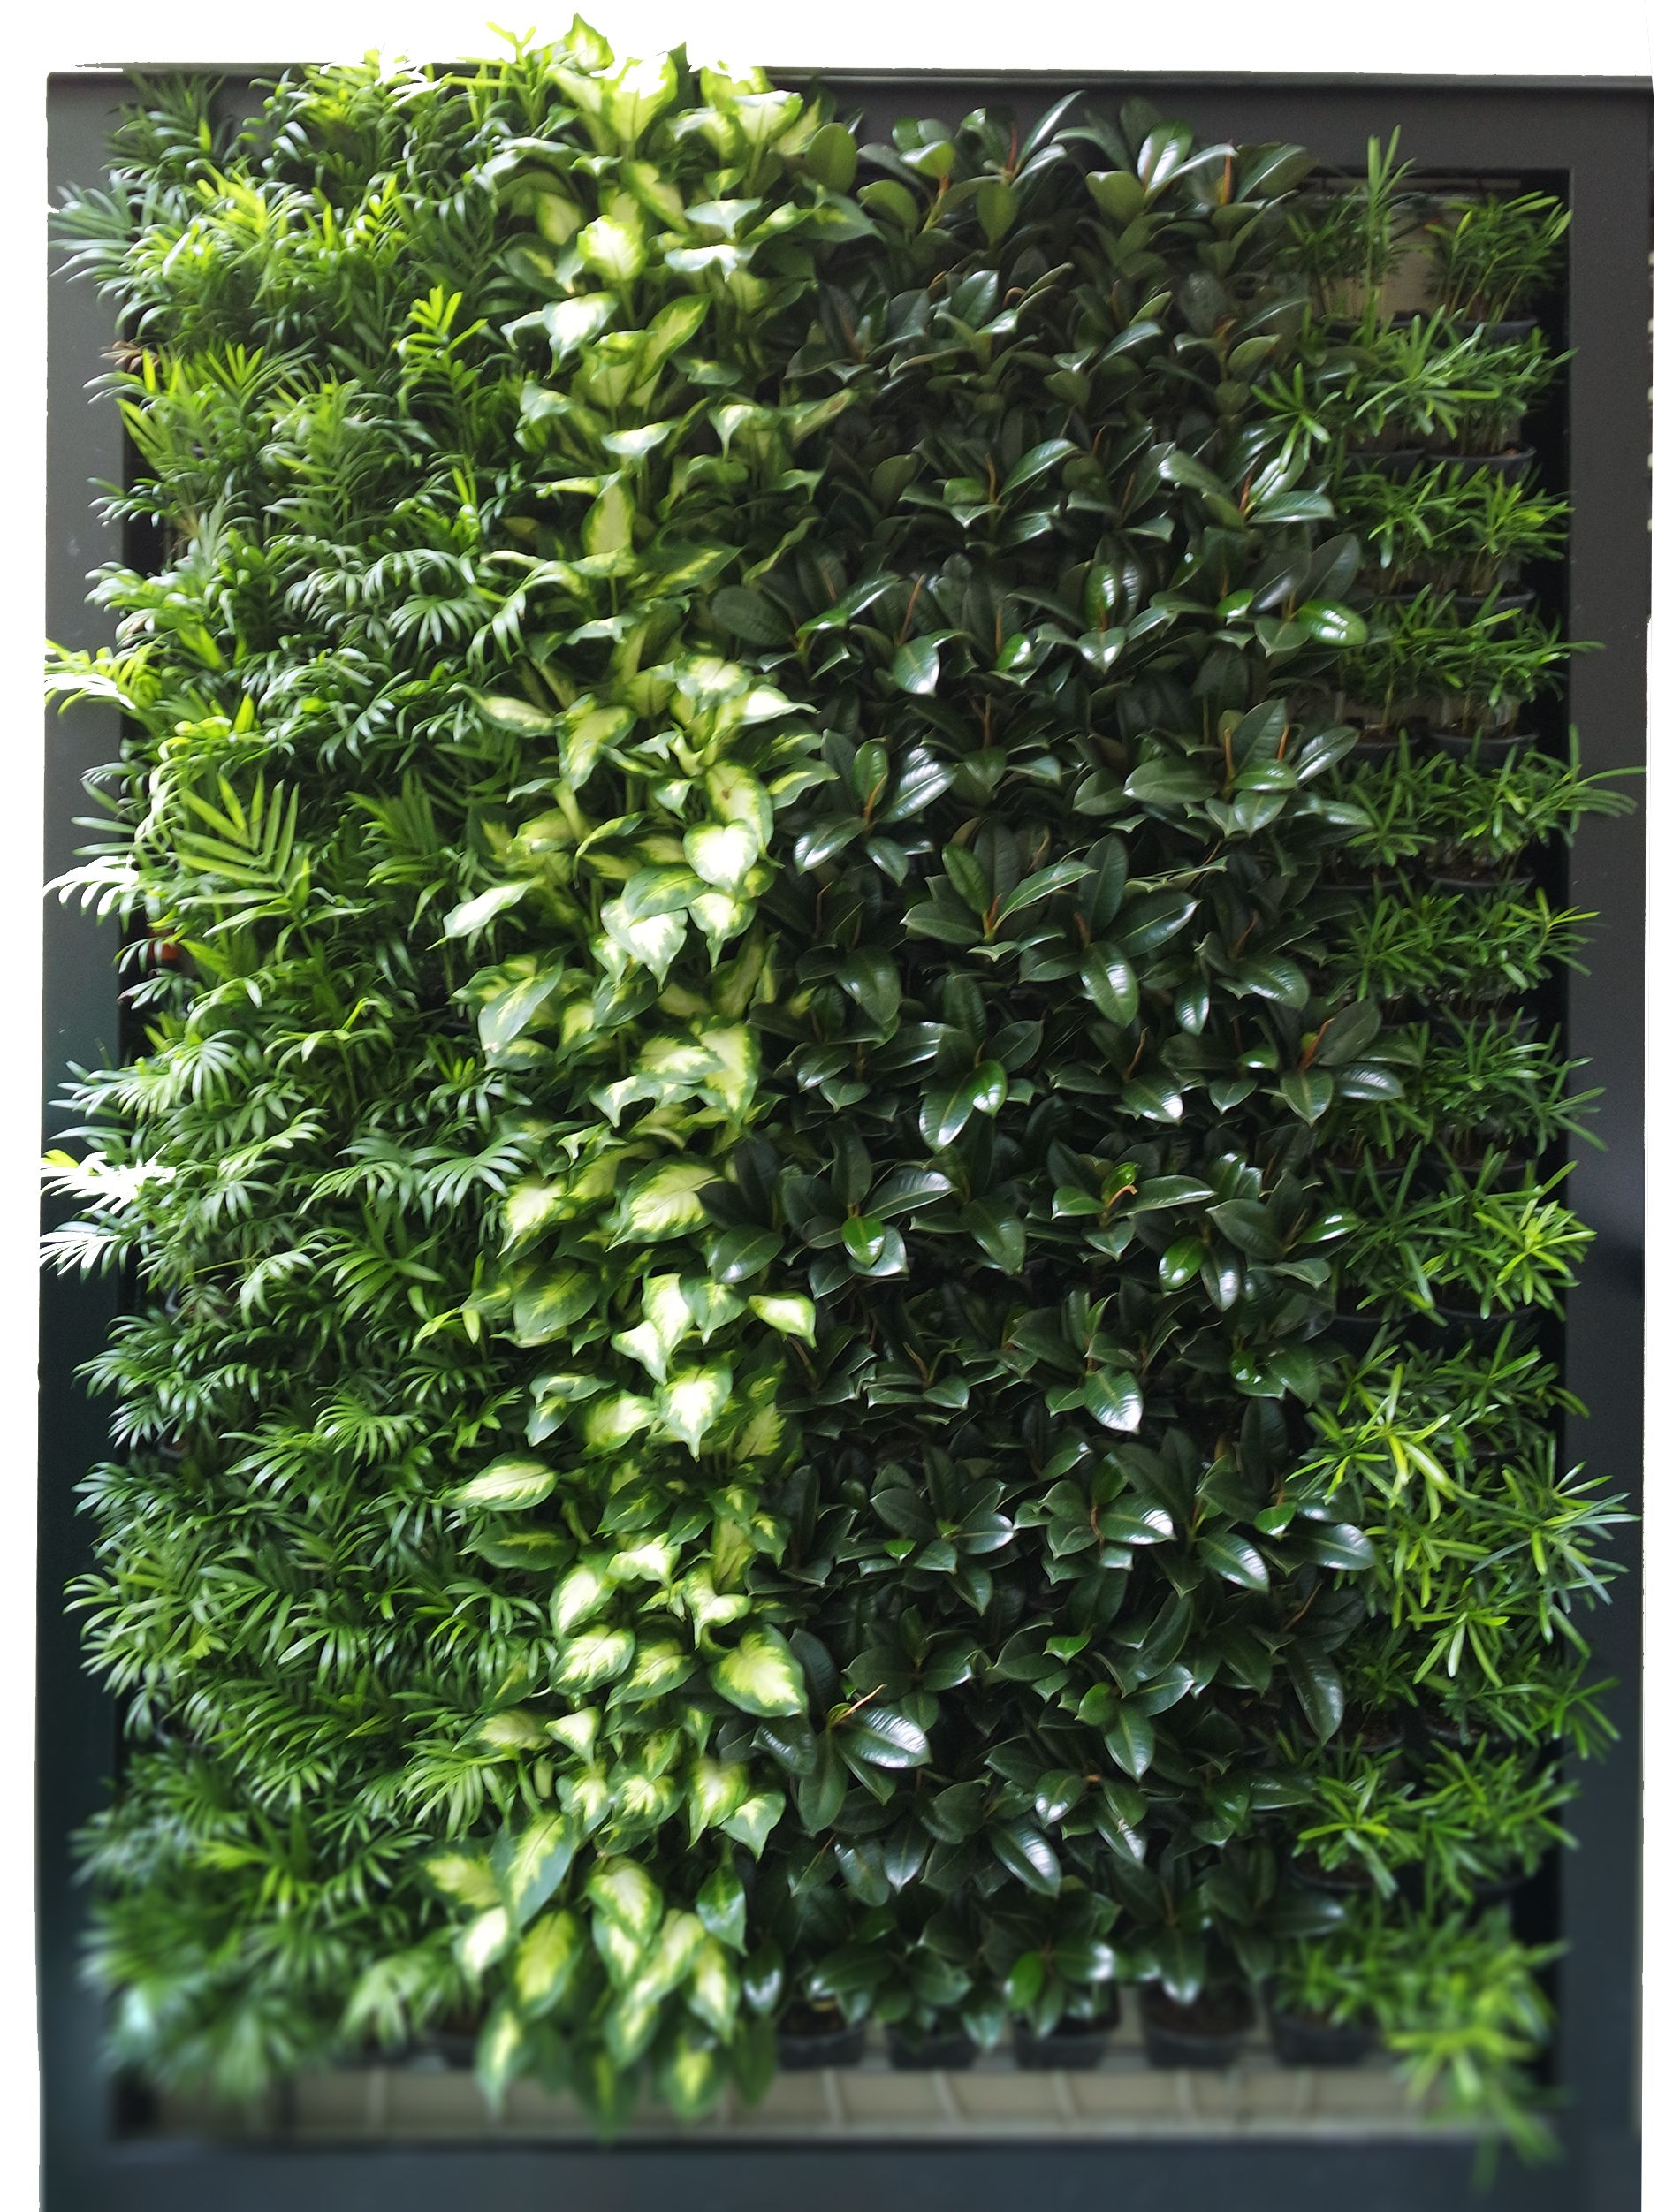 Greenamic integrated green wall and hydroponics